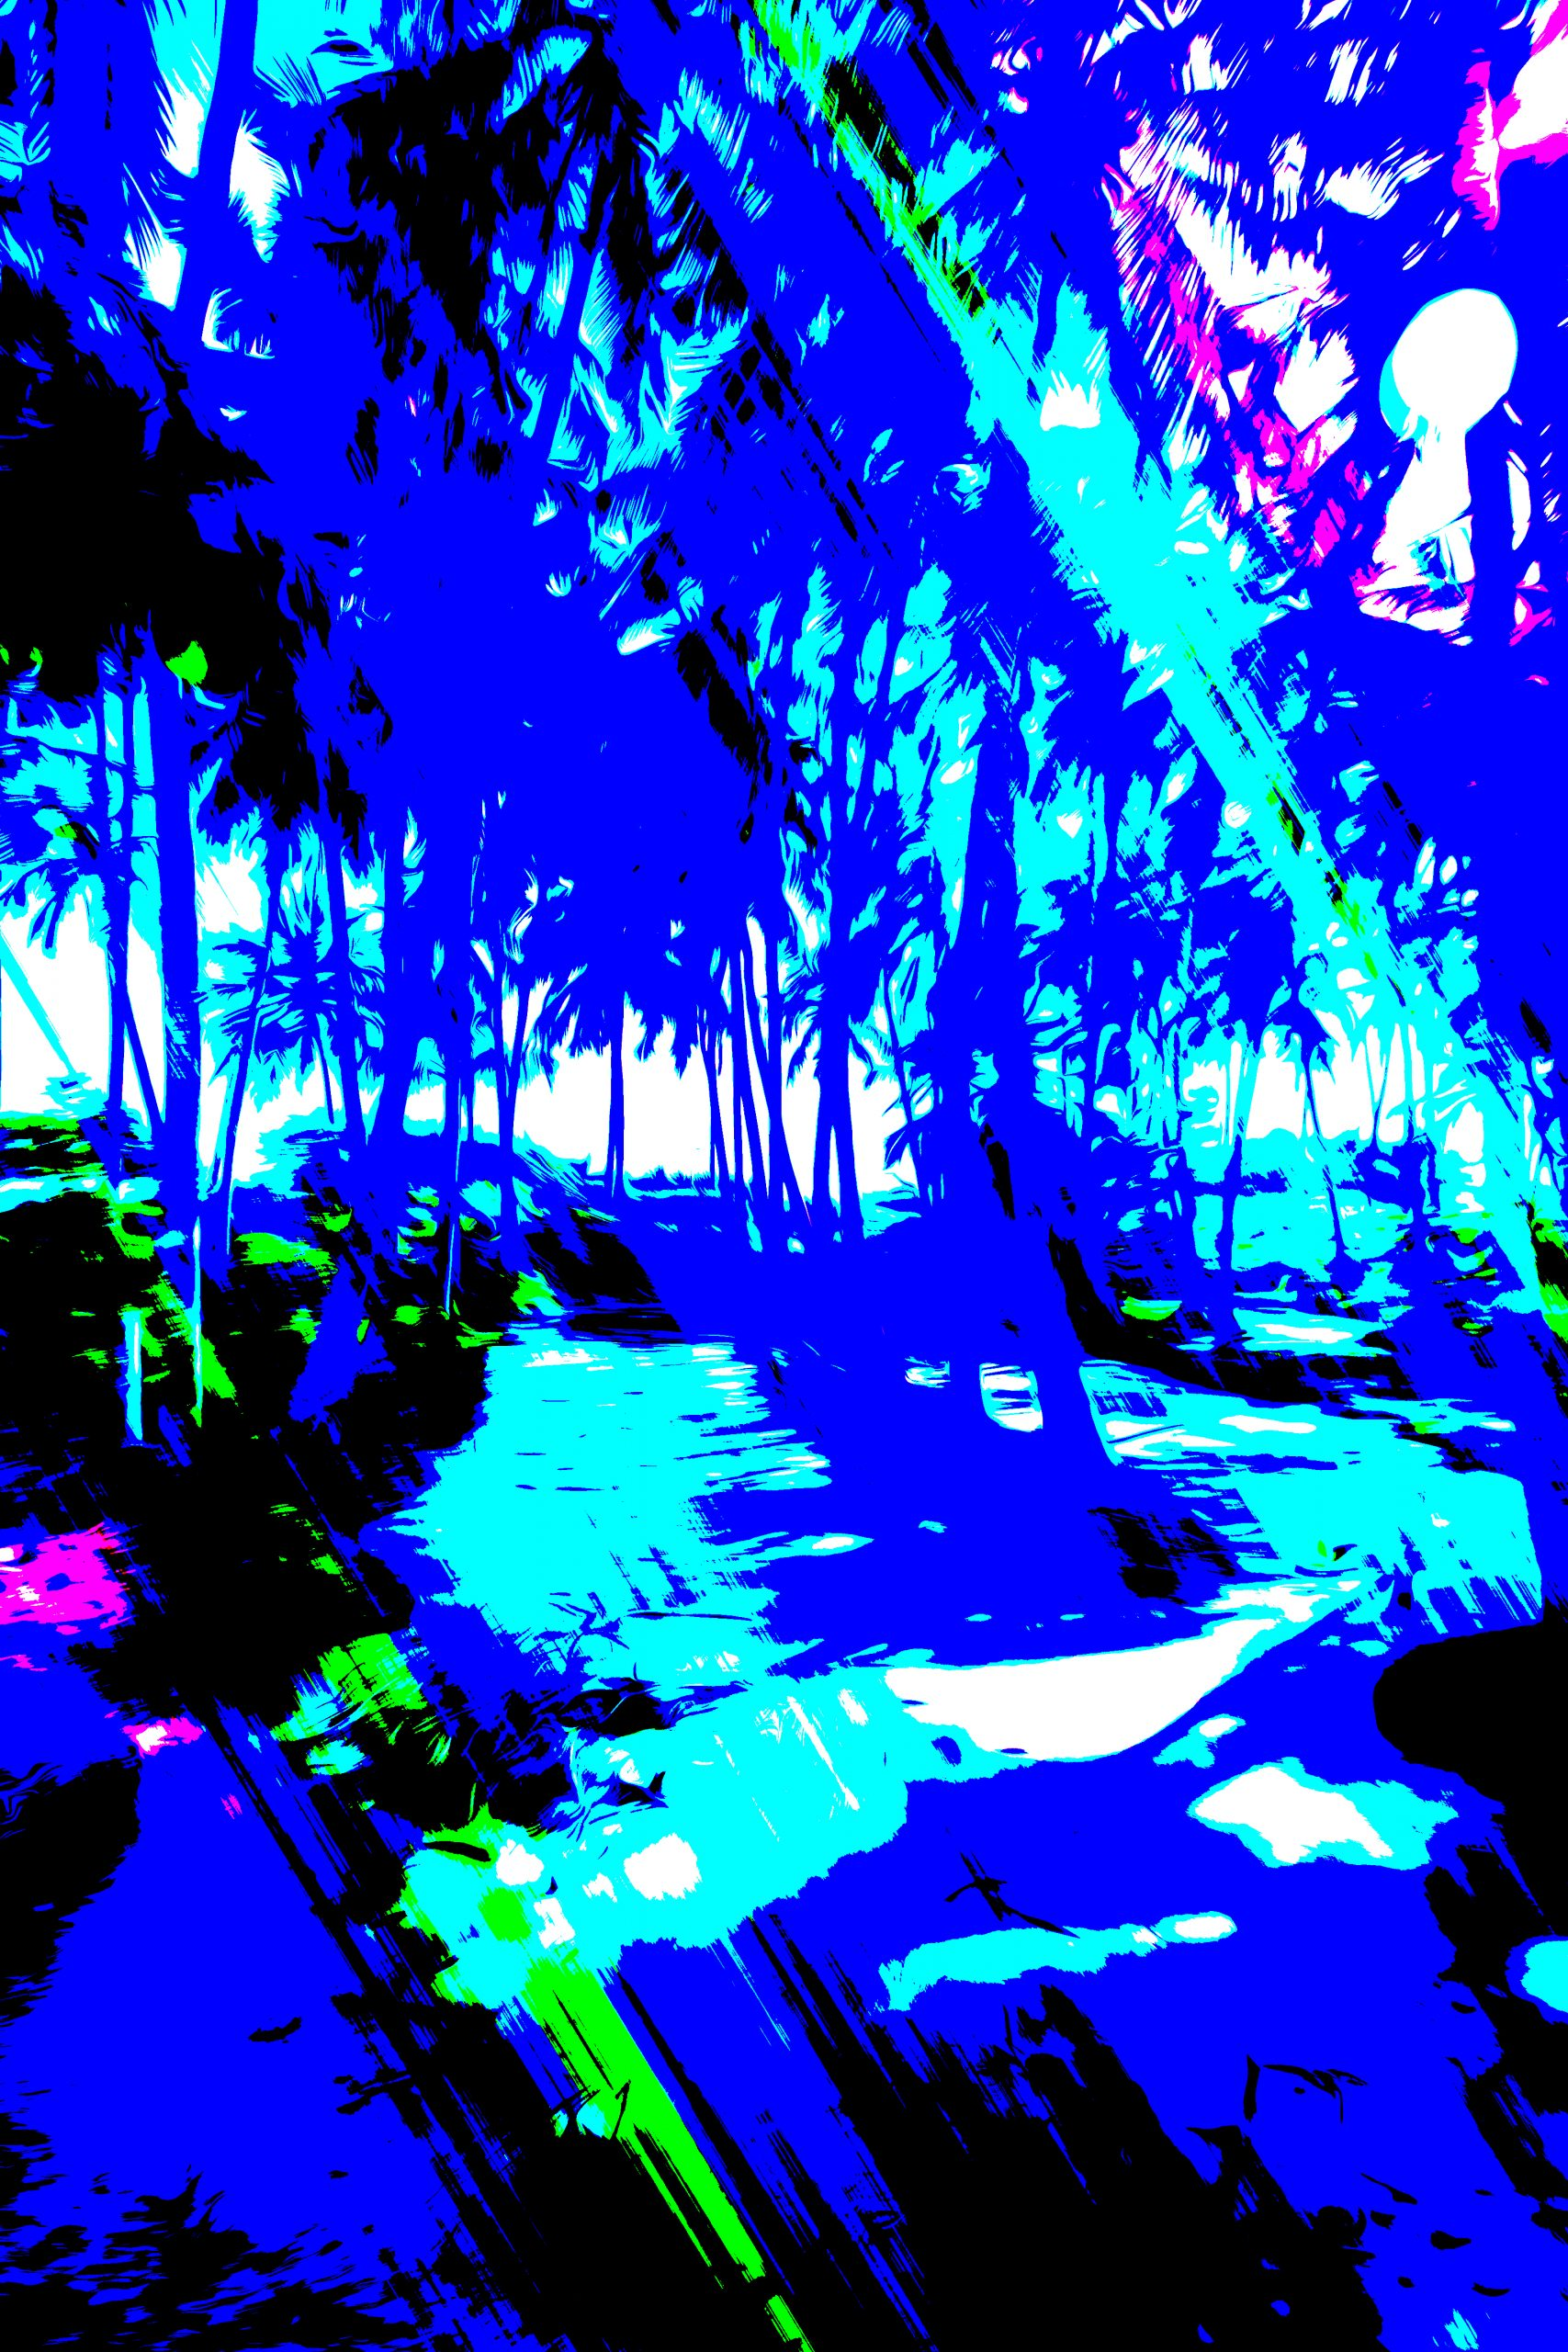 Illustration of a jungle